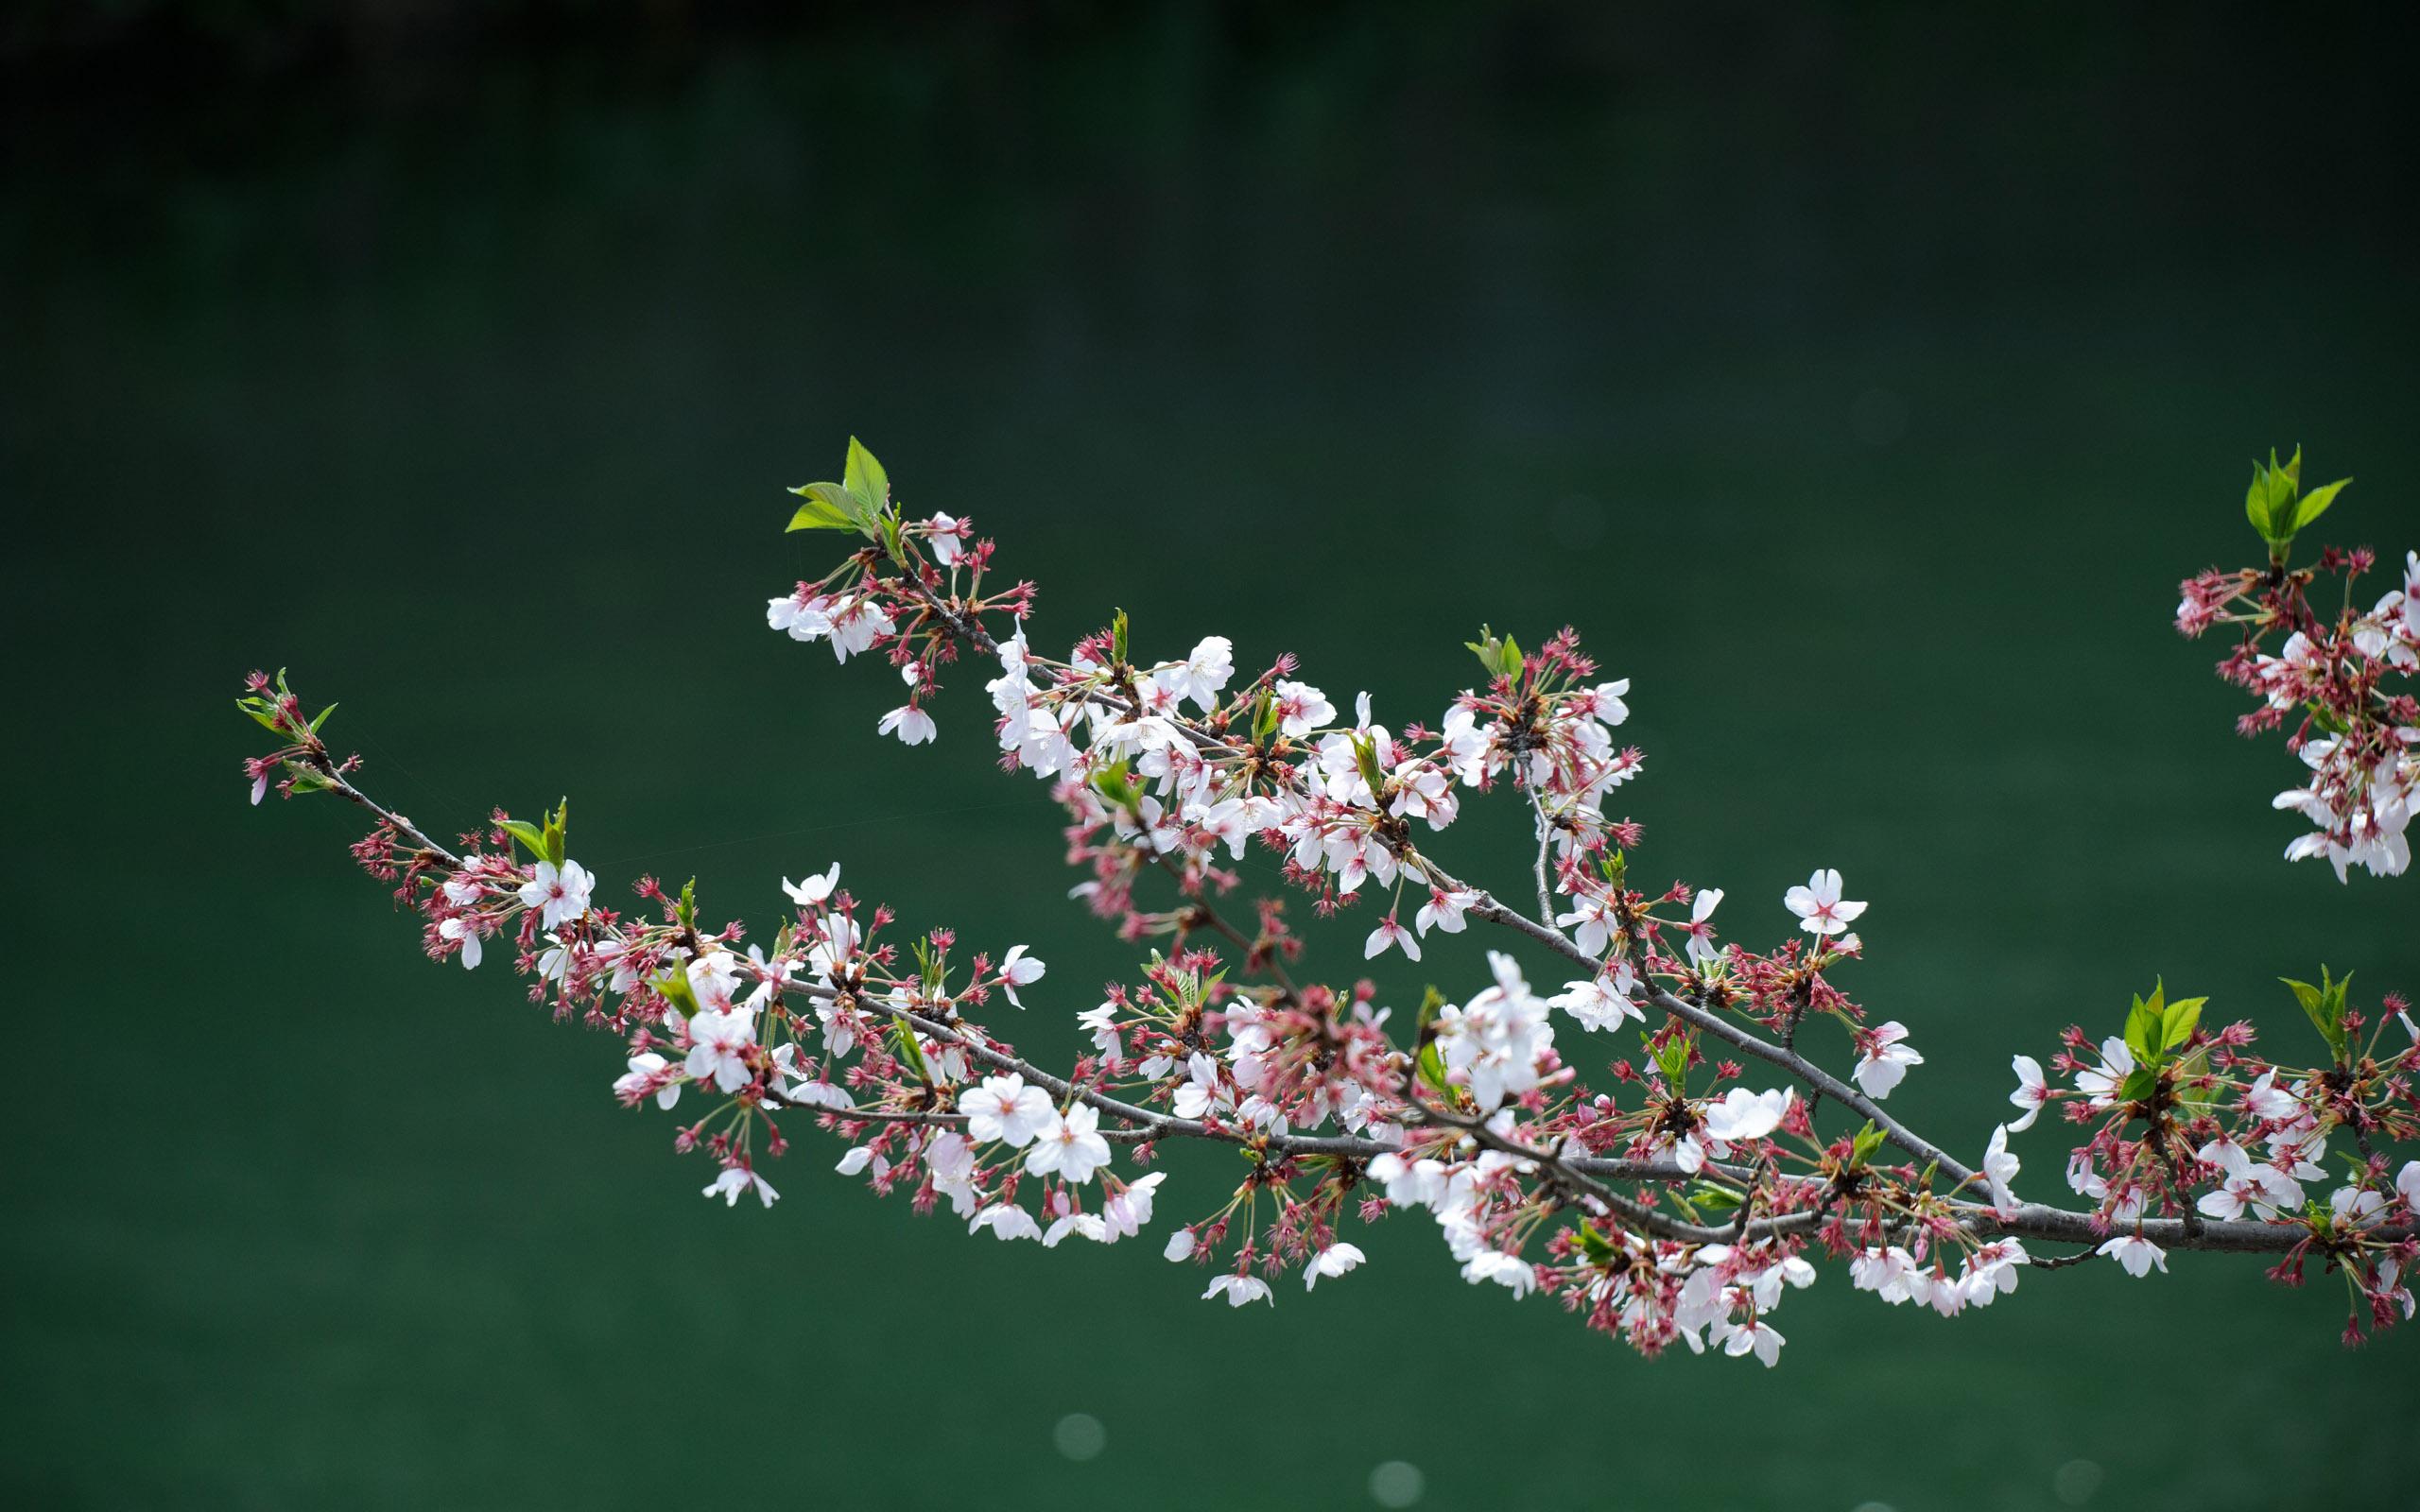 японские картинки ветки вишни представитель